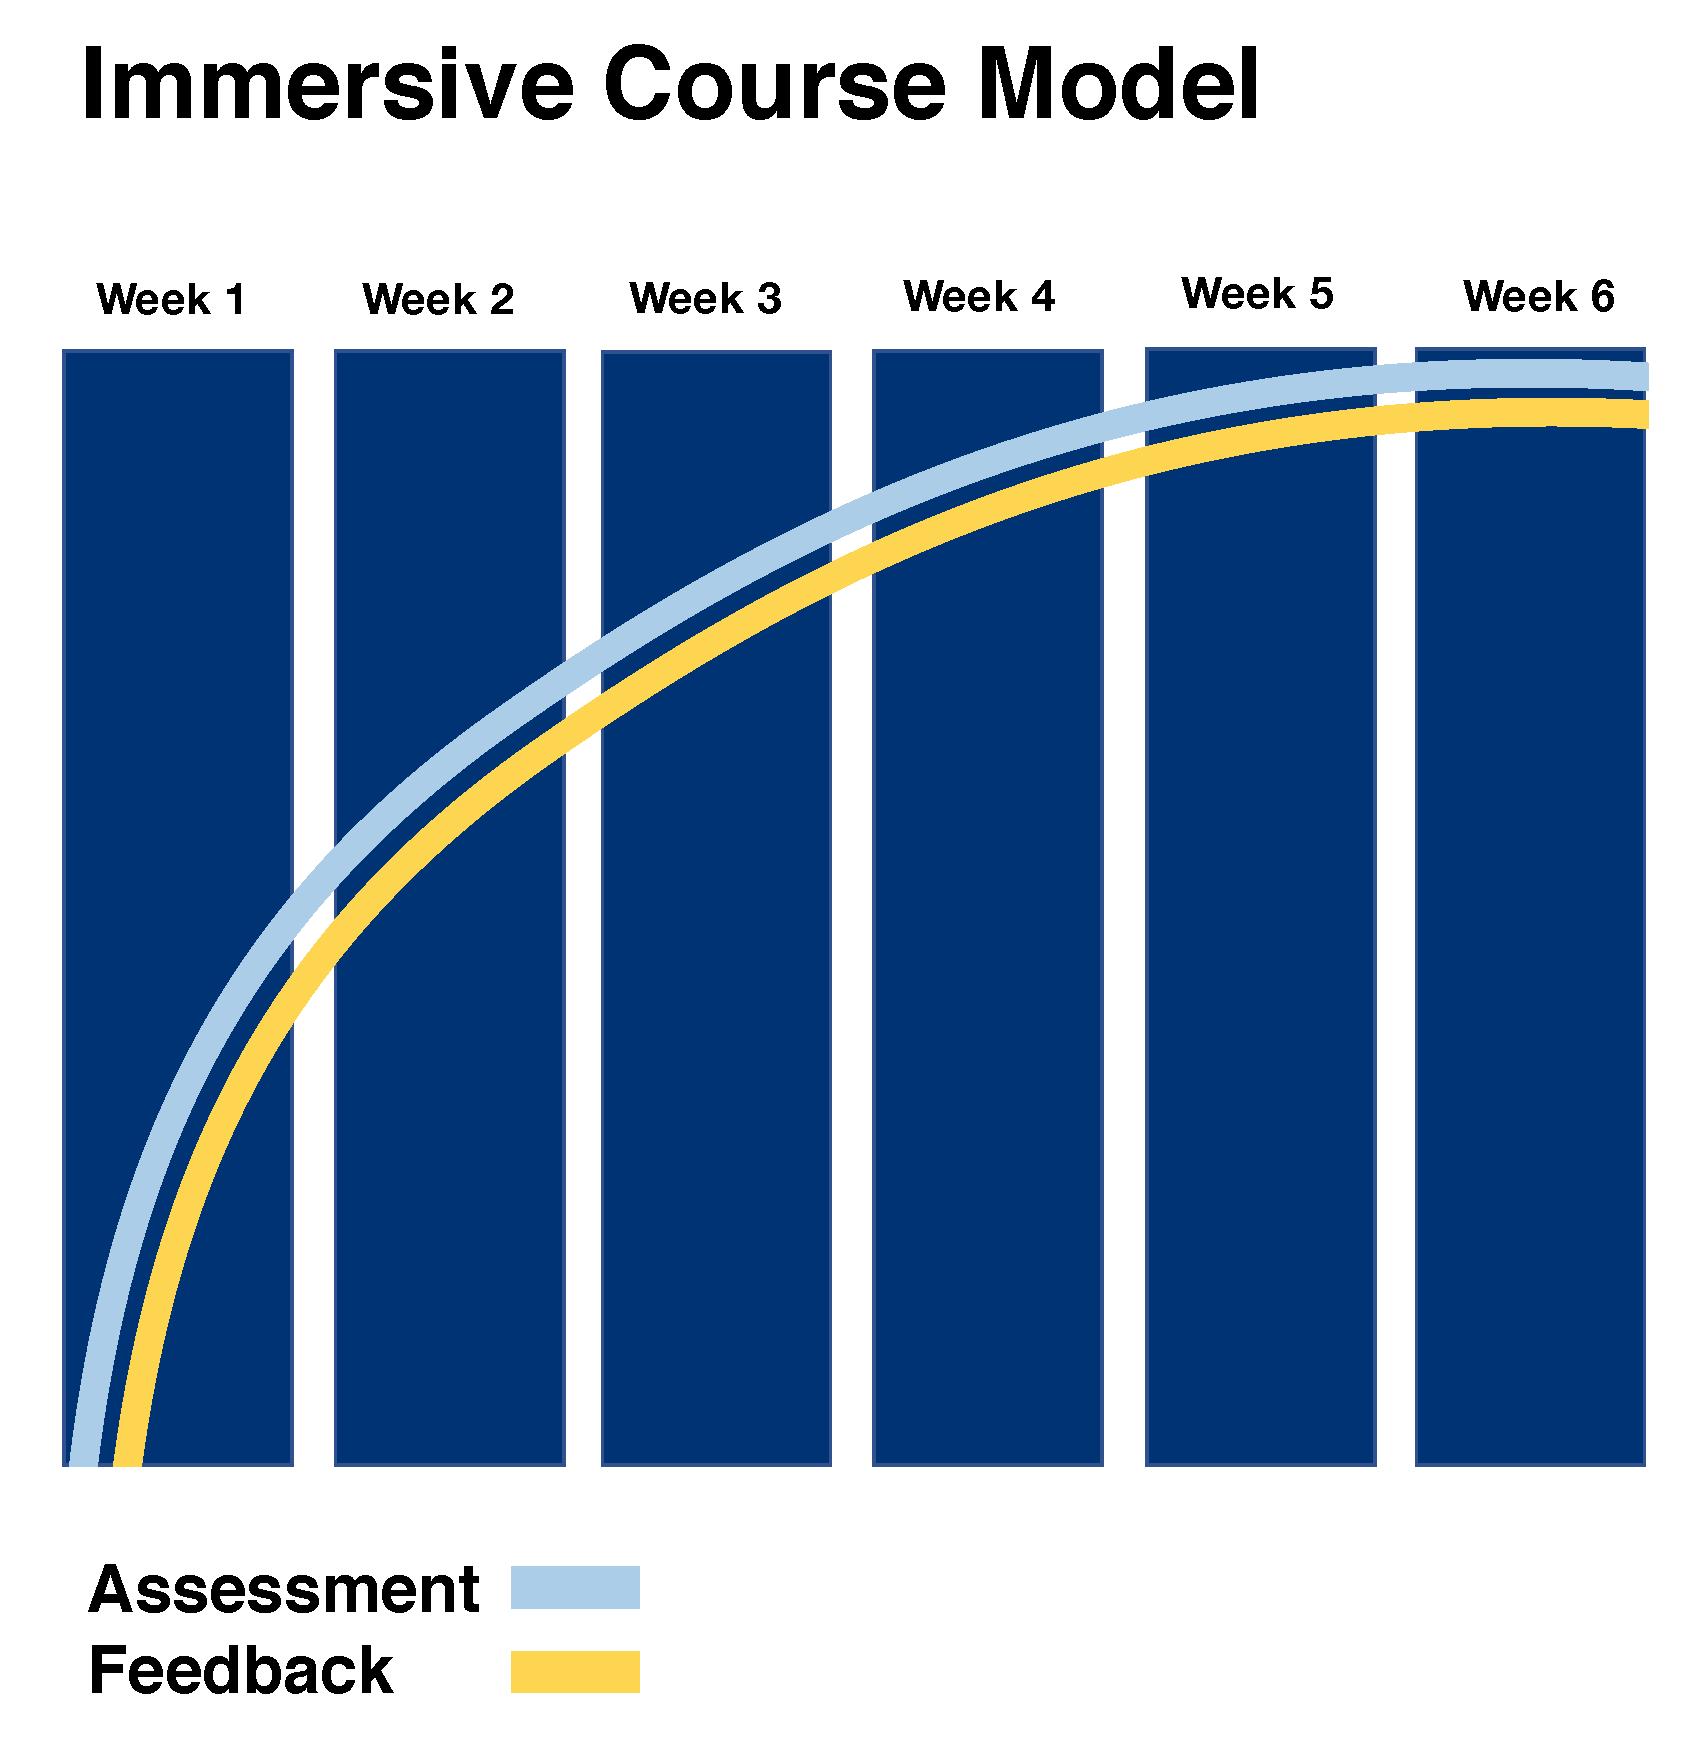 Immersive Course Model